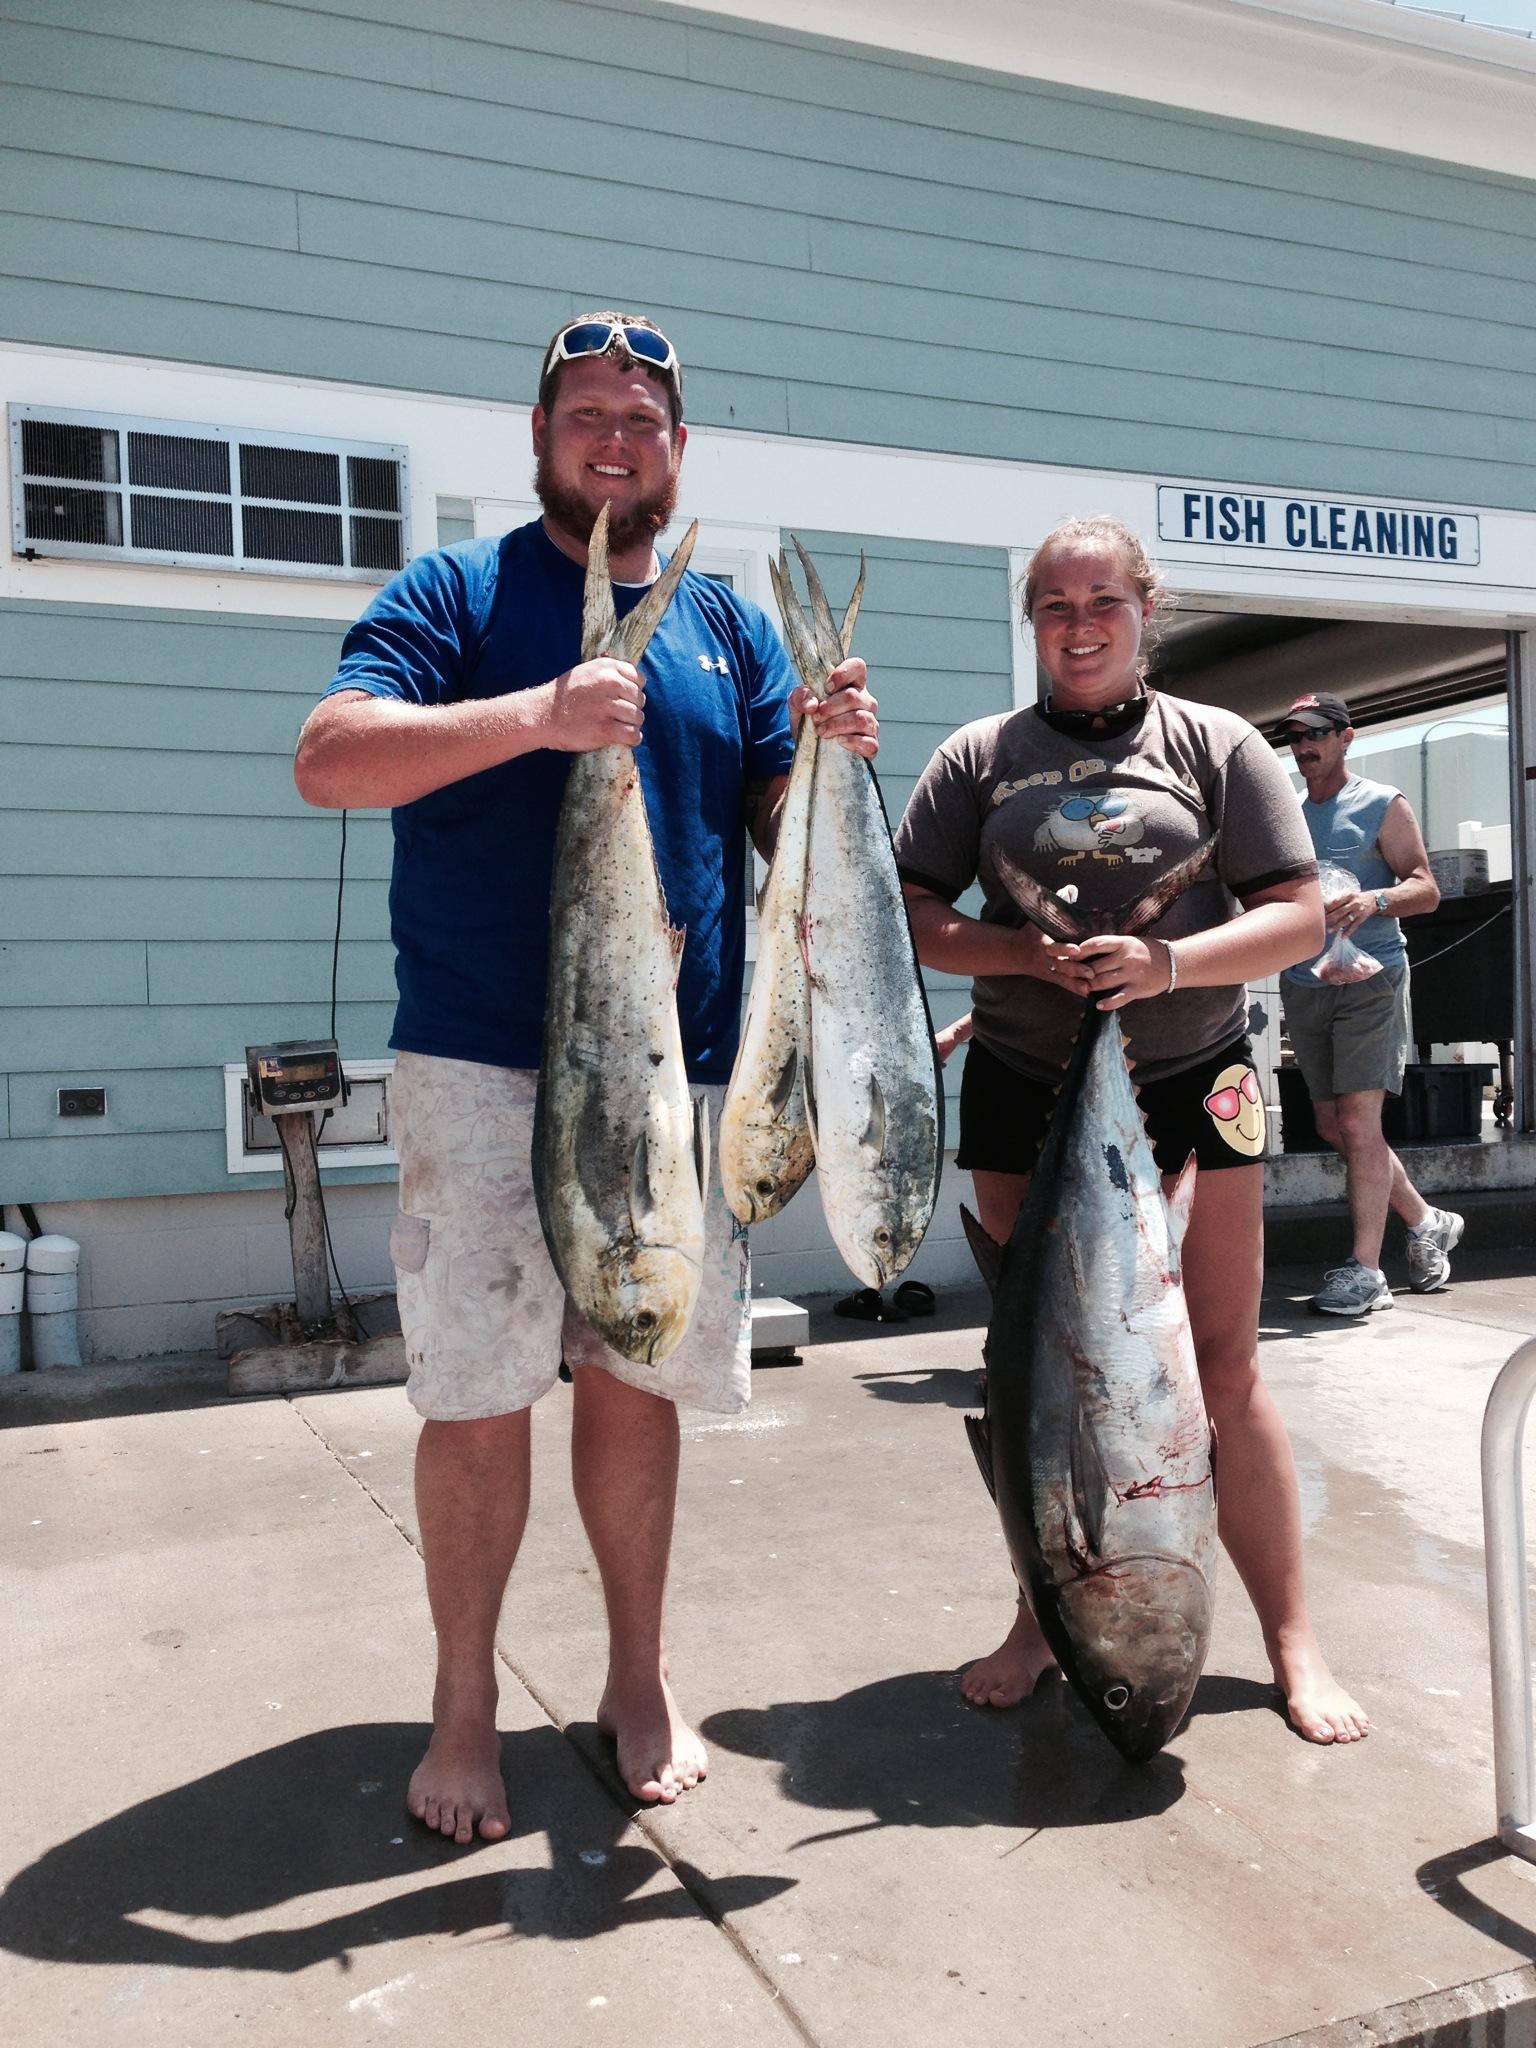 15 July 2014 Indian River Marina Fishing Reports